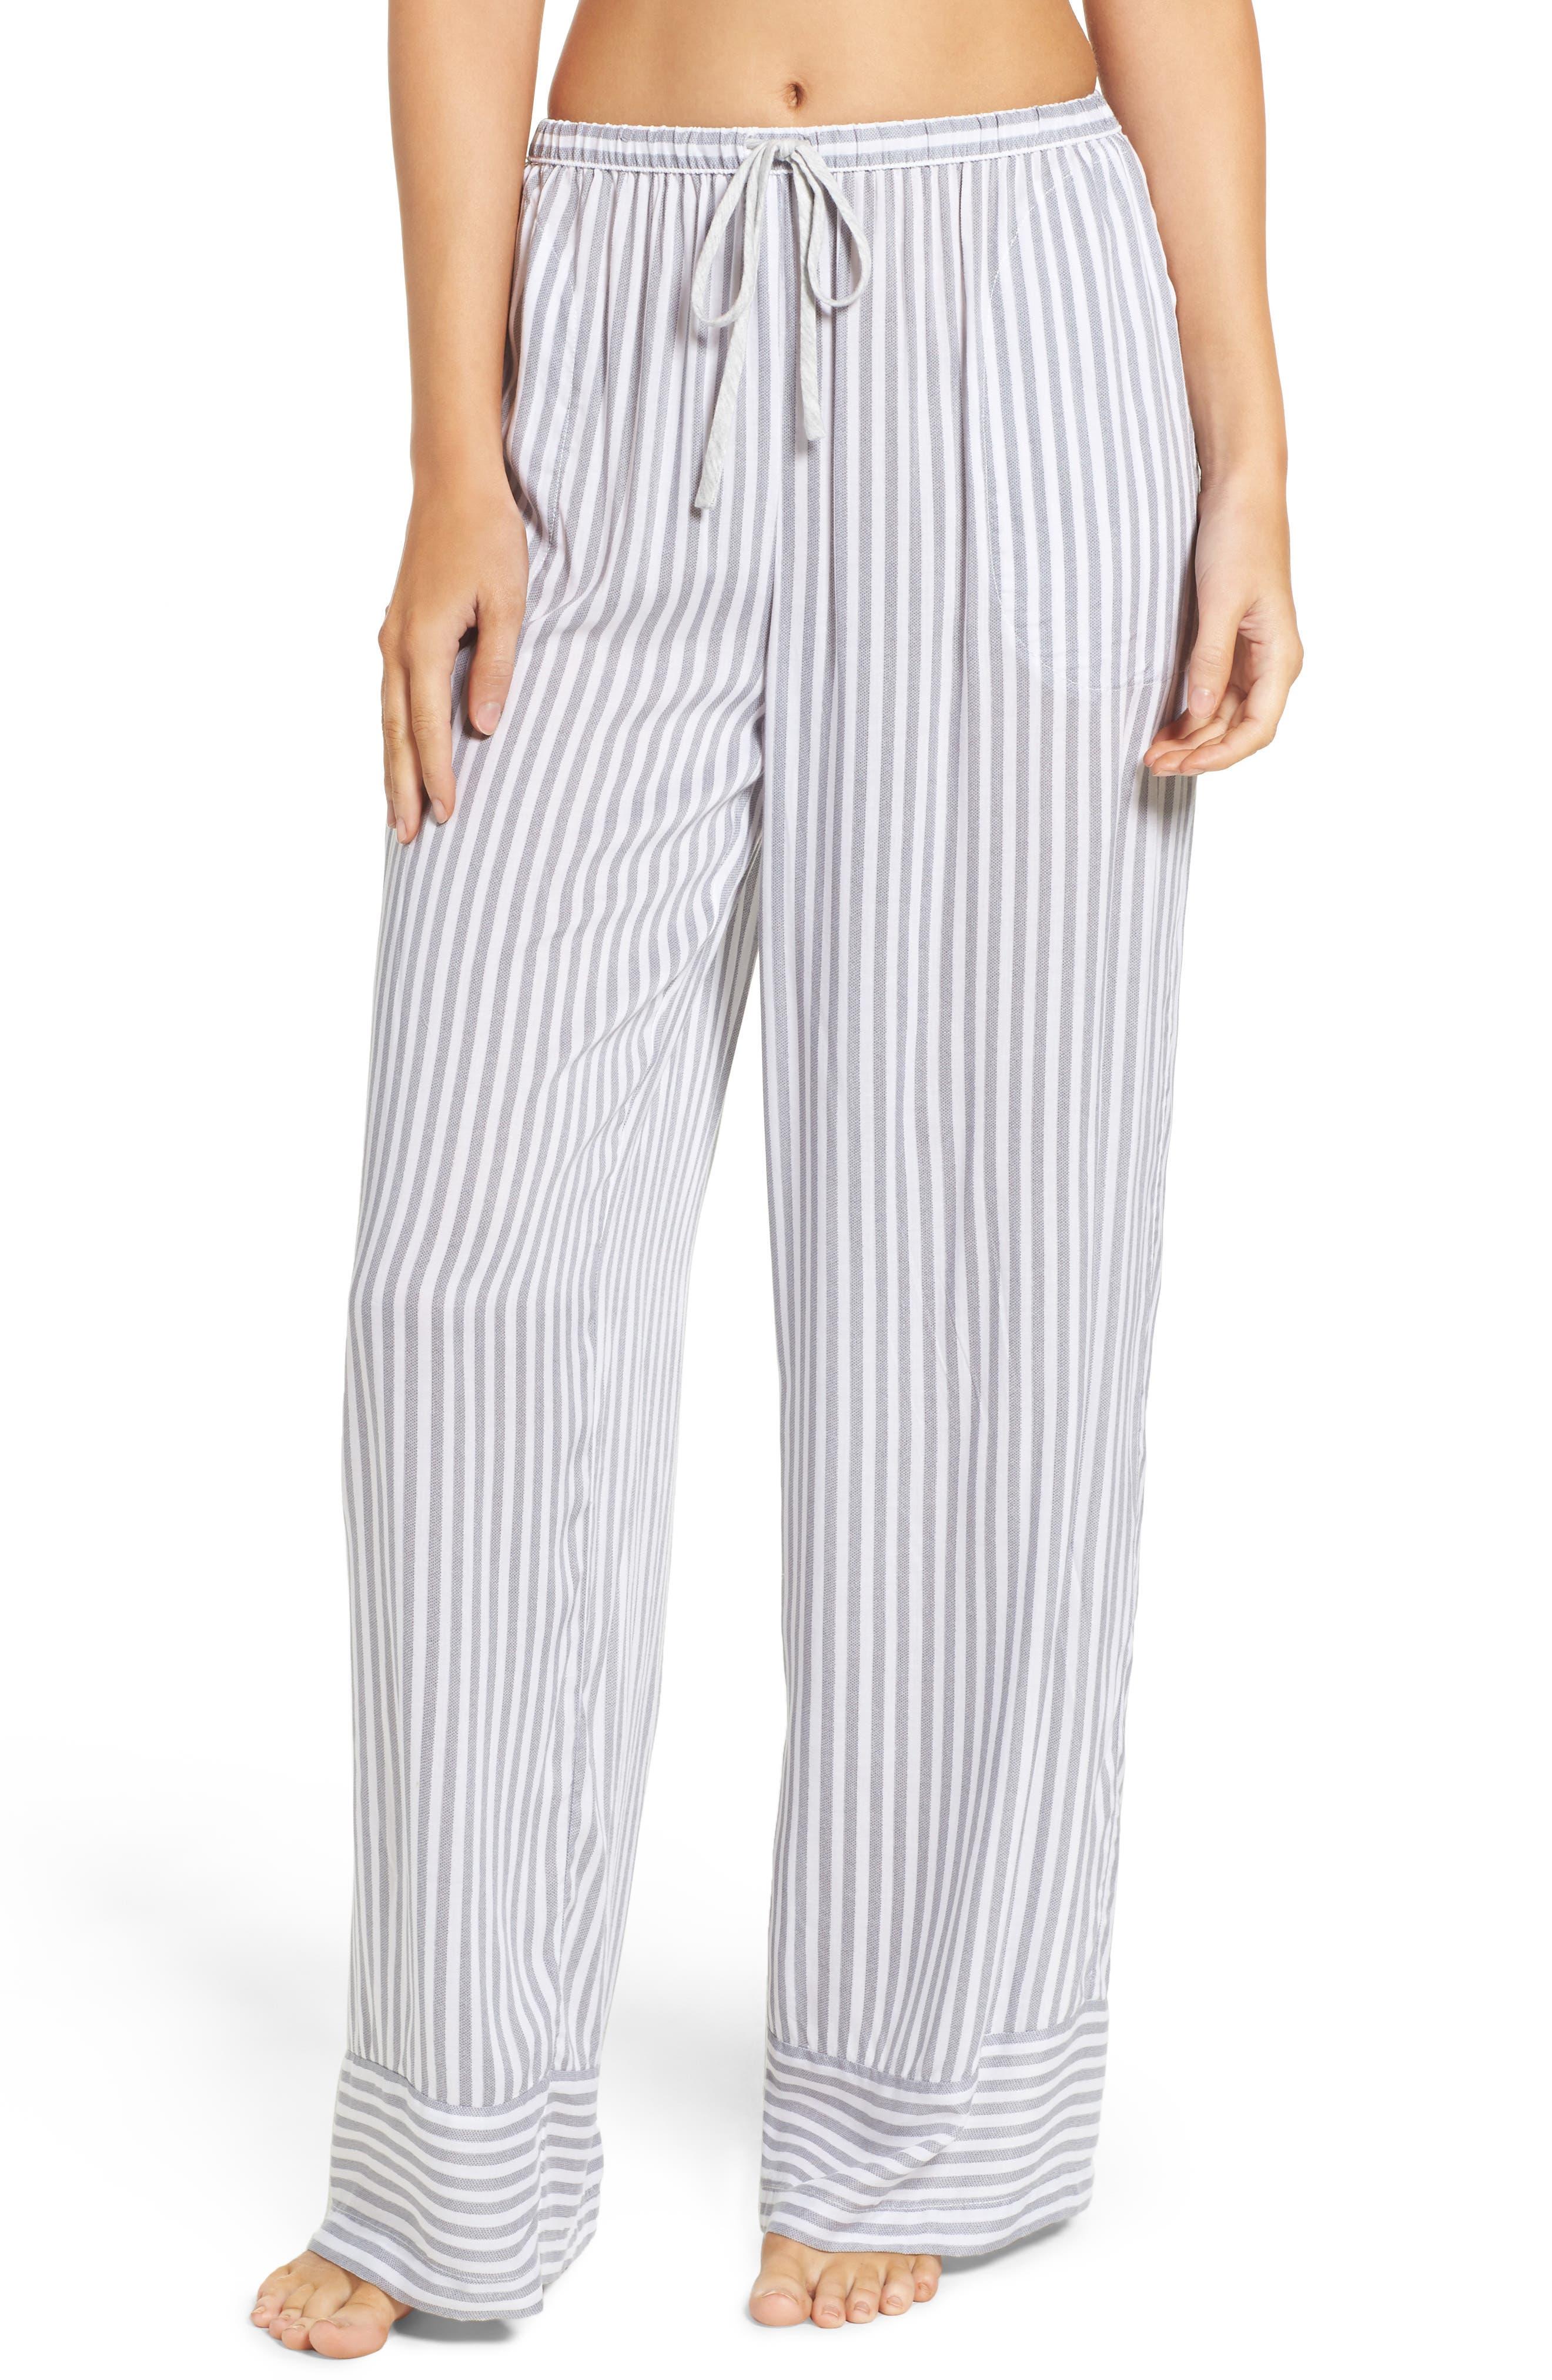 DKNY Stripe Pajama Pants